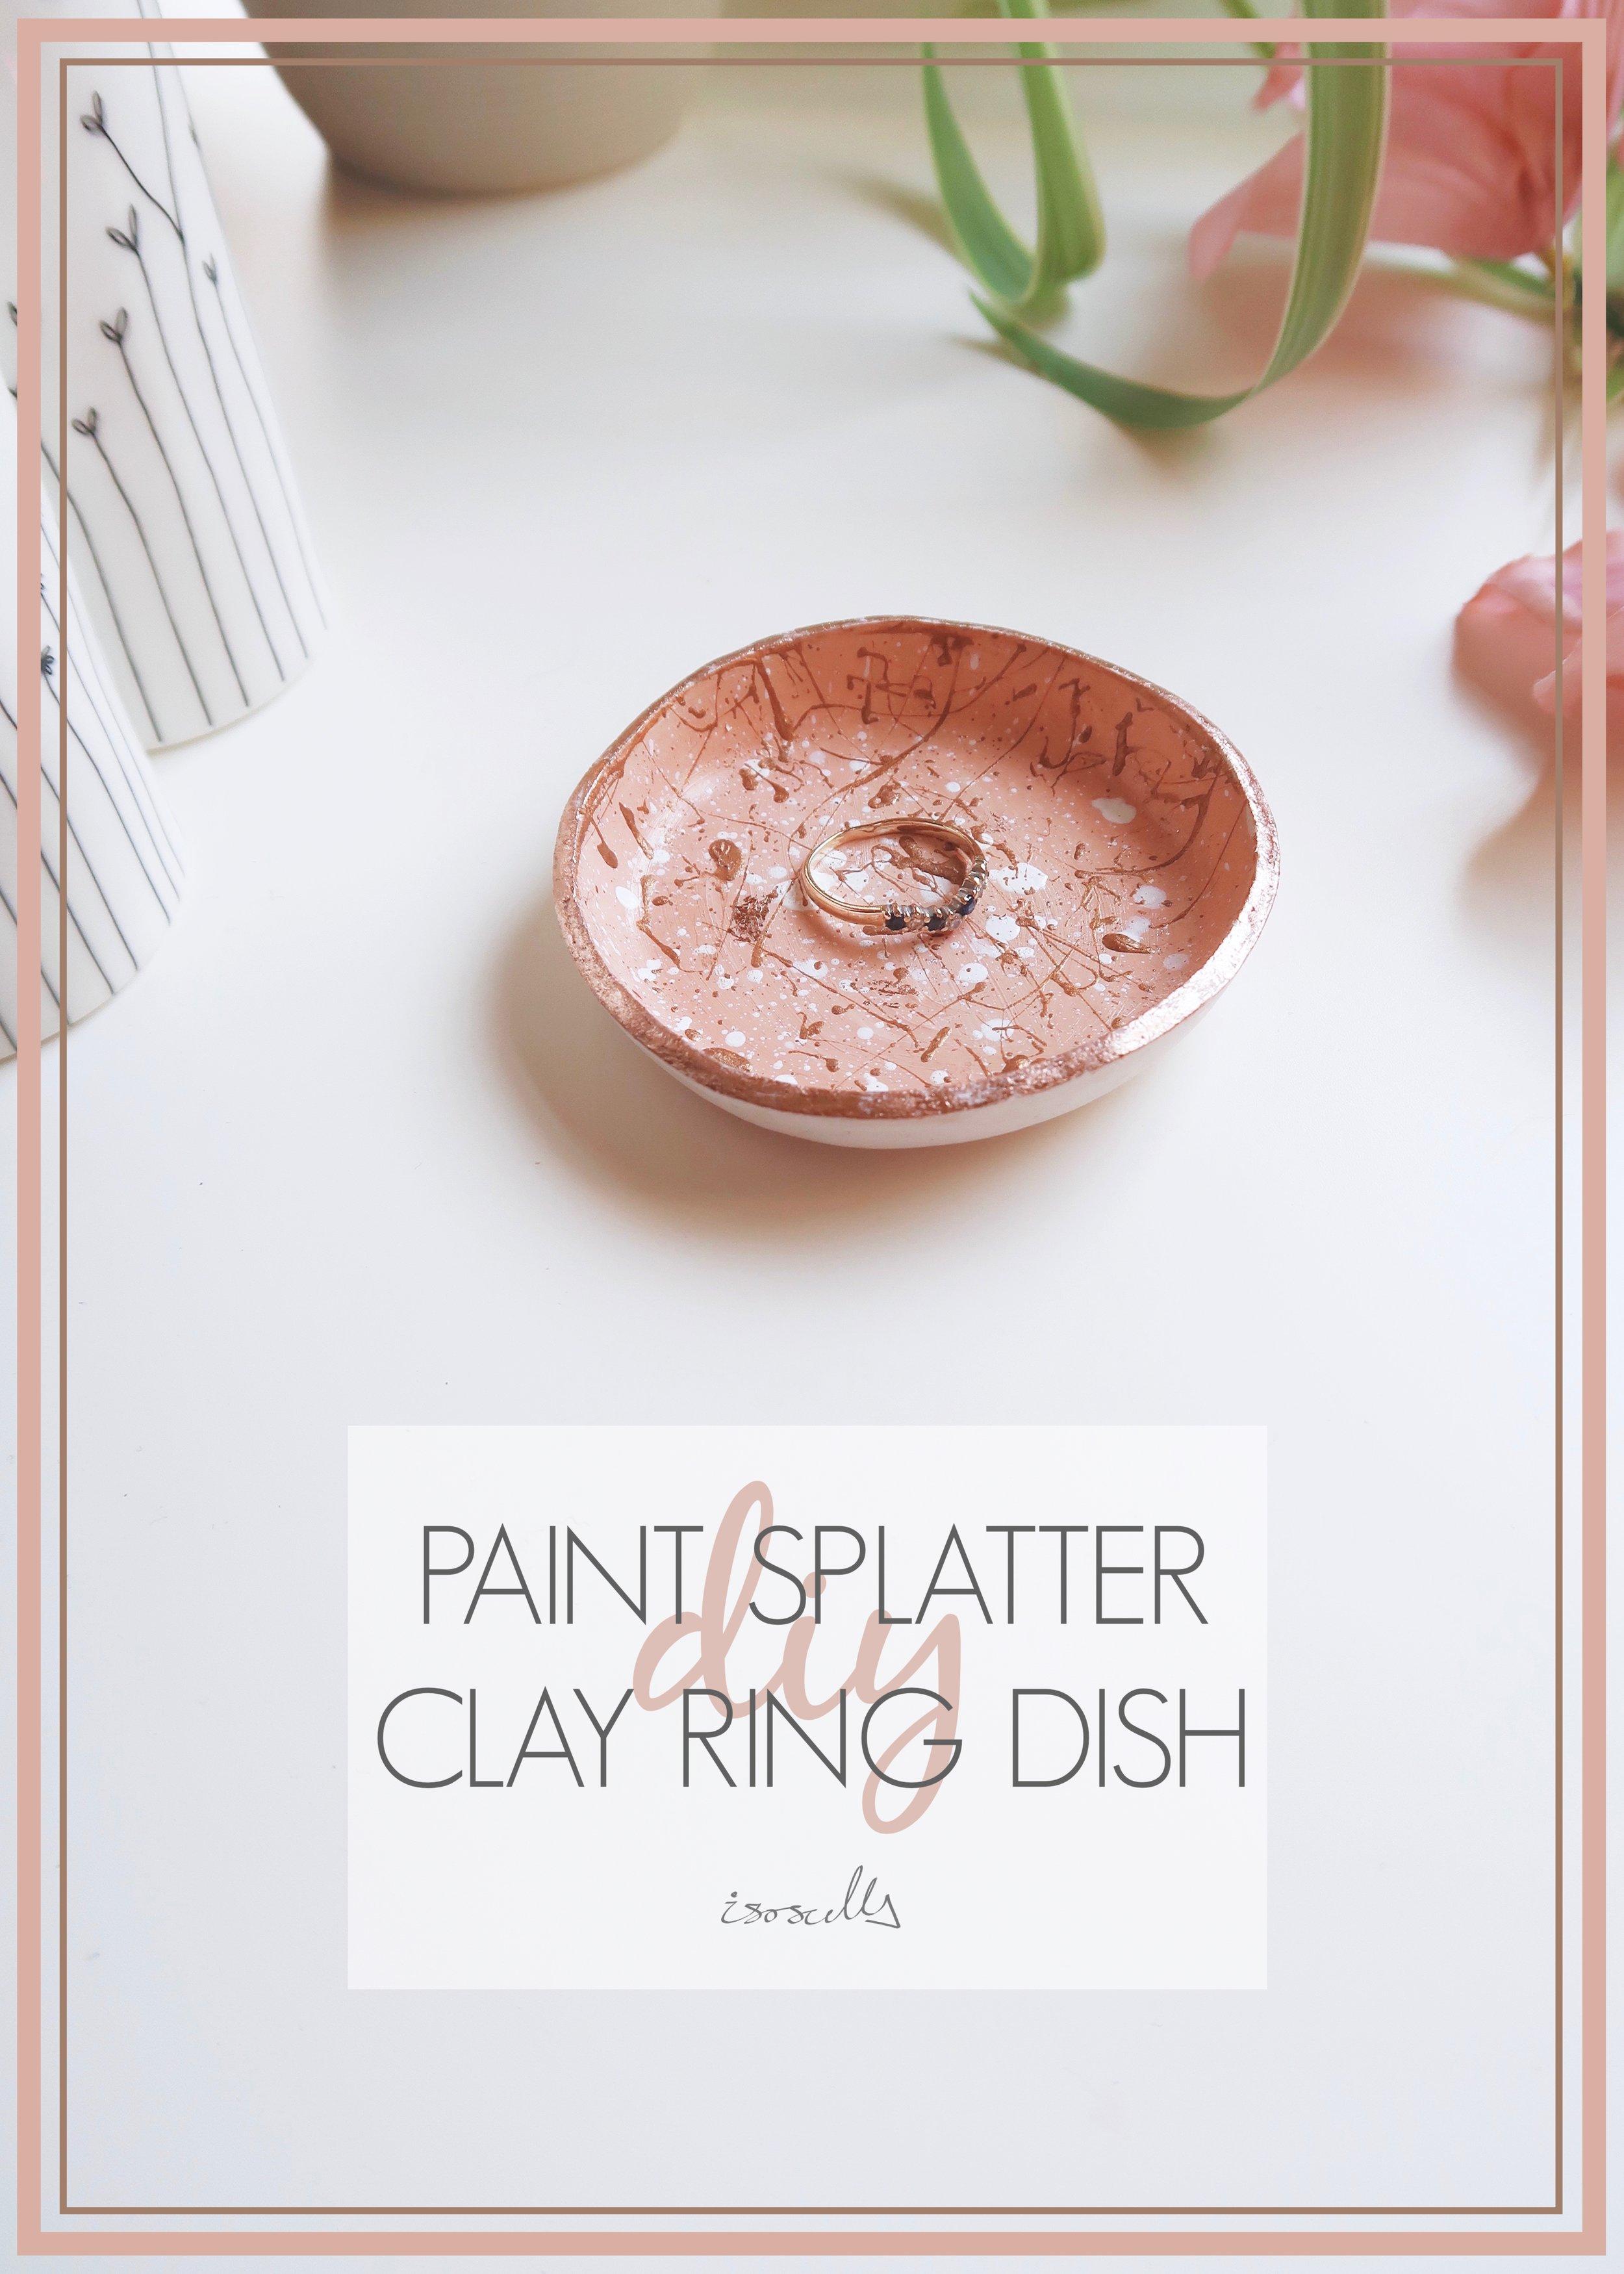 DIY Paint Splatter Clay Ring Dish - Isoscella